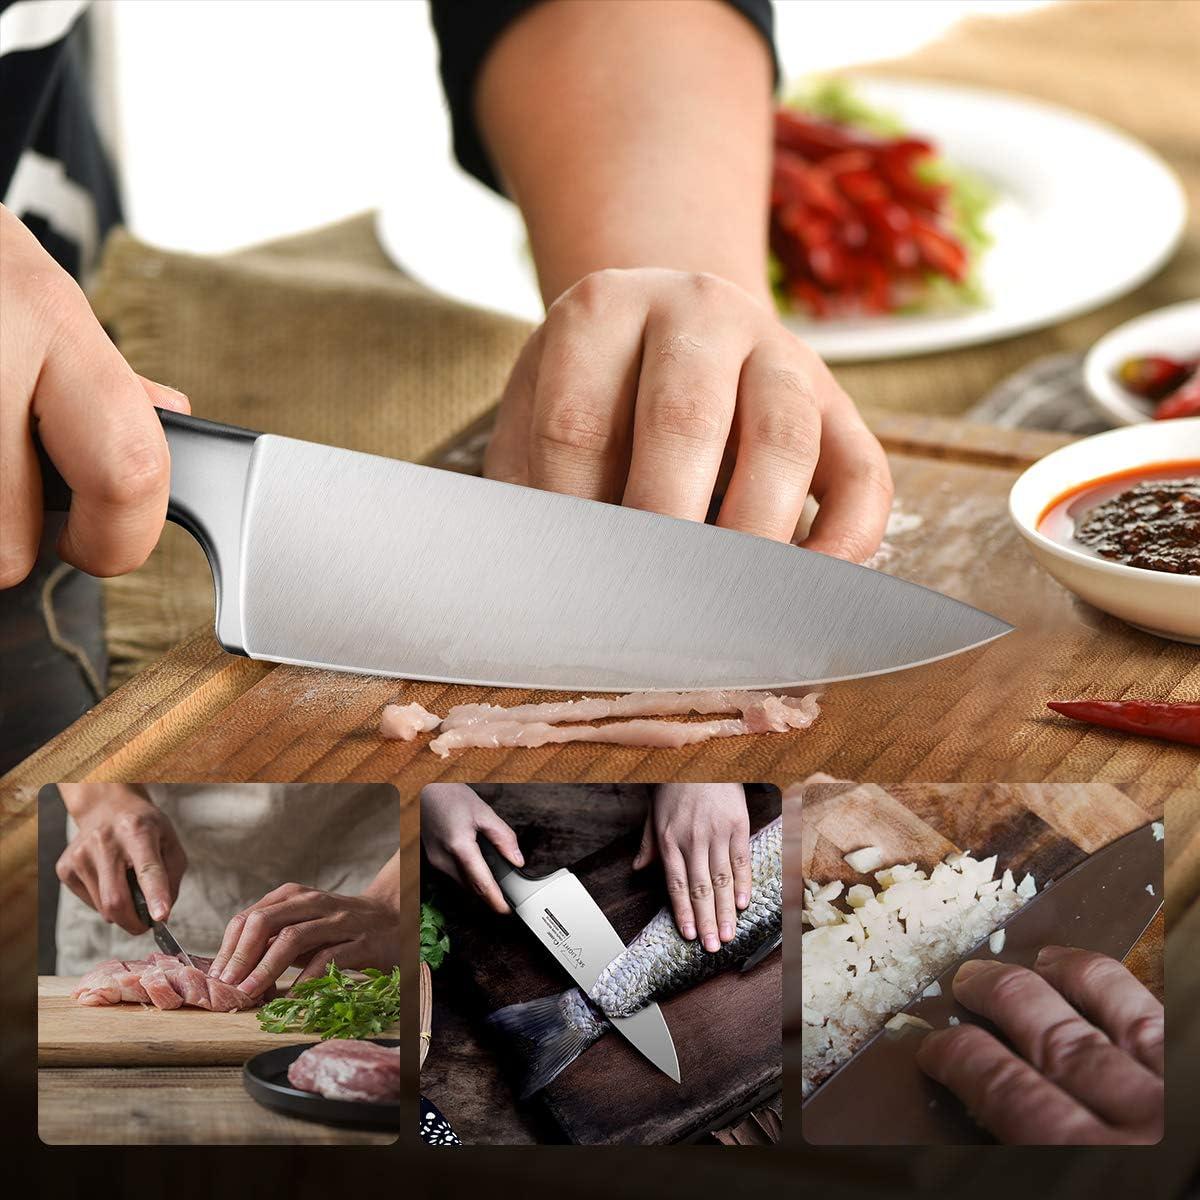 SKY LIGHT Cuchillo de Chef alem/án Acero Inoxidable de Alto Carbono Cuchillos de Cocina con Mango ergon/ómico